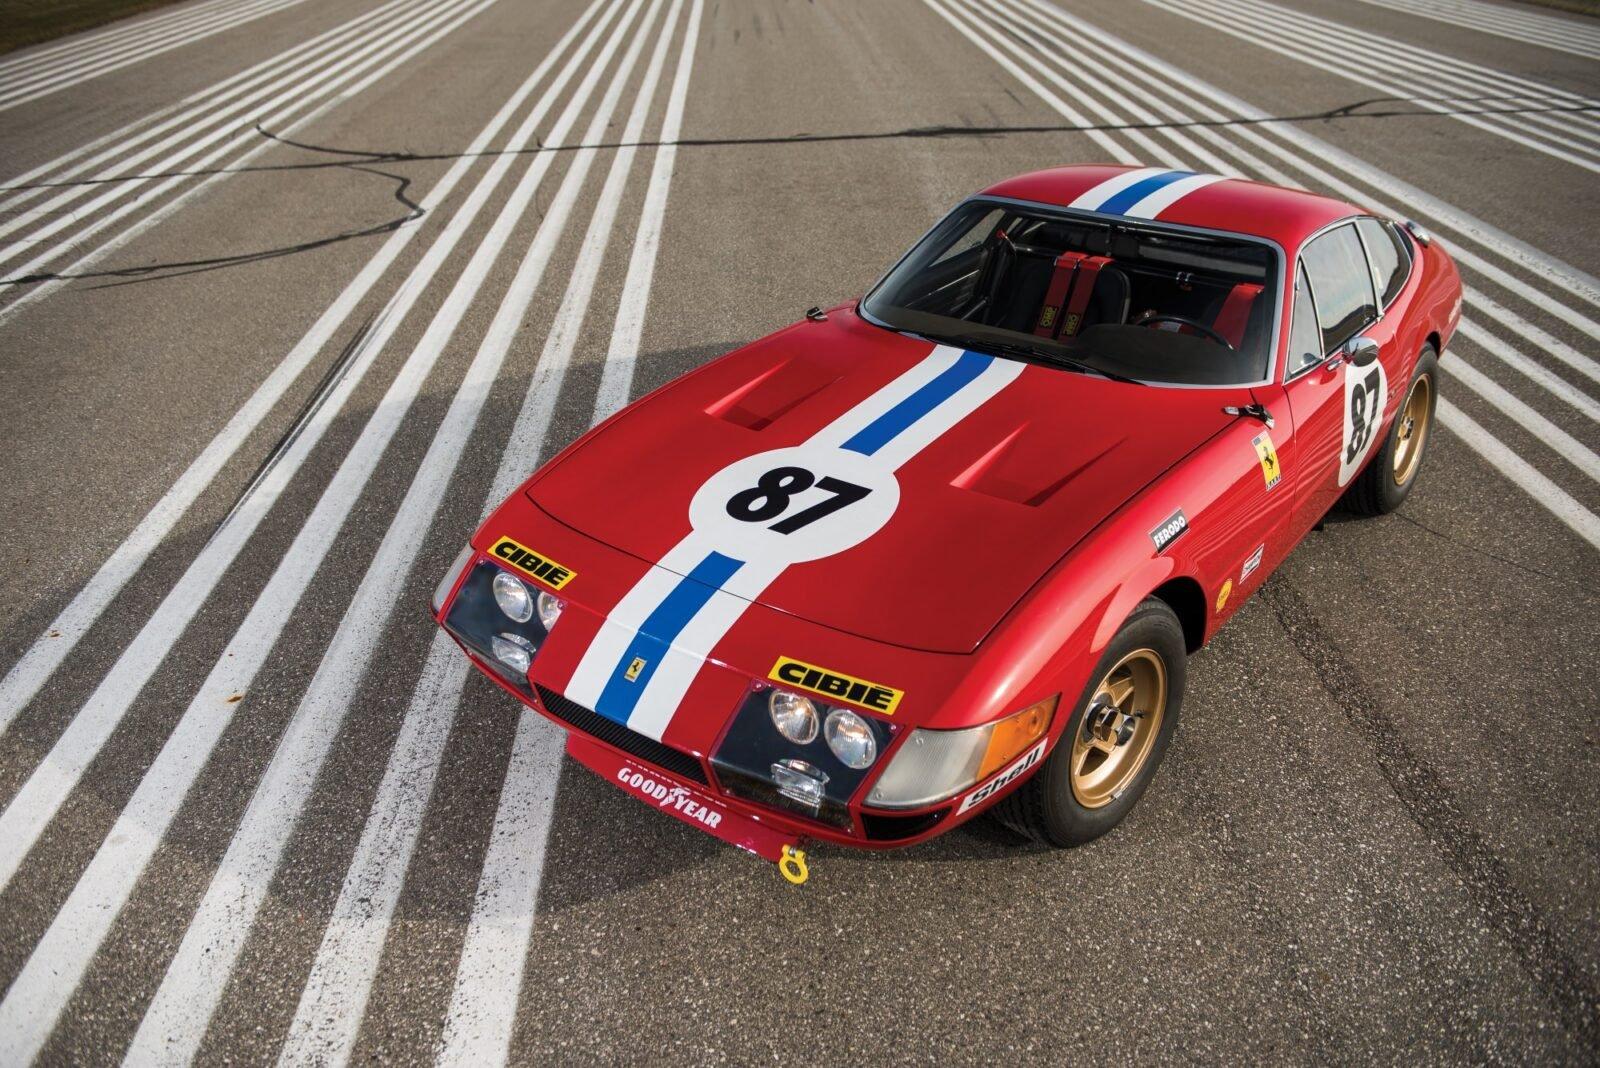 ferrari 365 gtb4 daytona 1 1600x1068 - Ferrari 365 GTB/4 Daytona Competizione Conversion